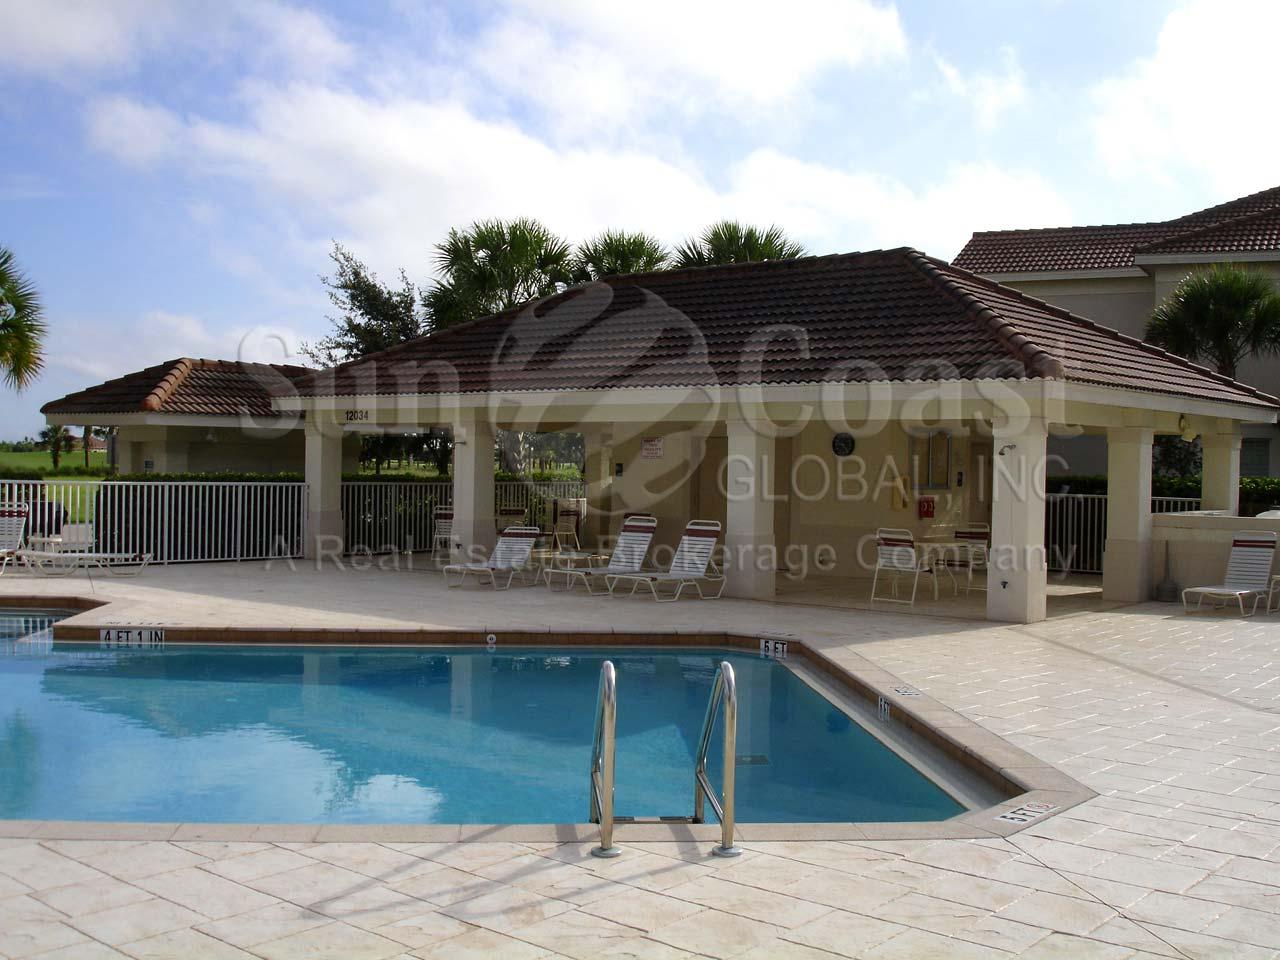 Covent garden outdoor pool garden ftempo - Outdoor swimming pool covent garden ...